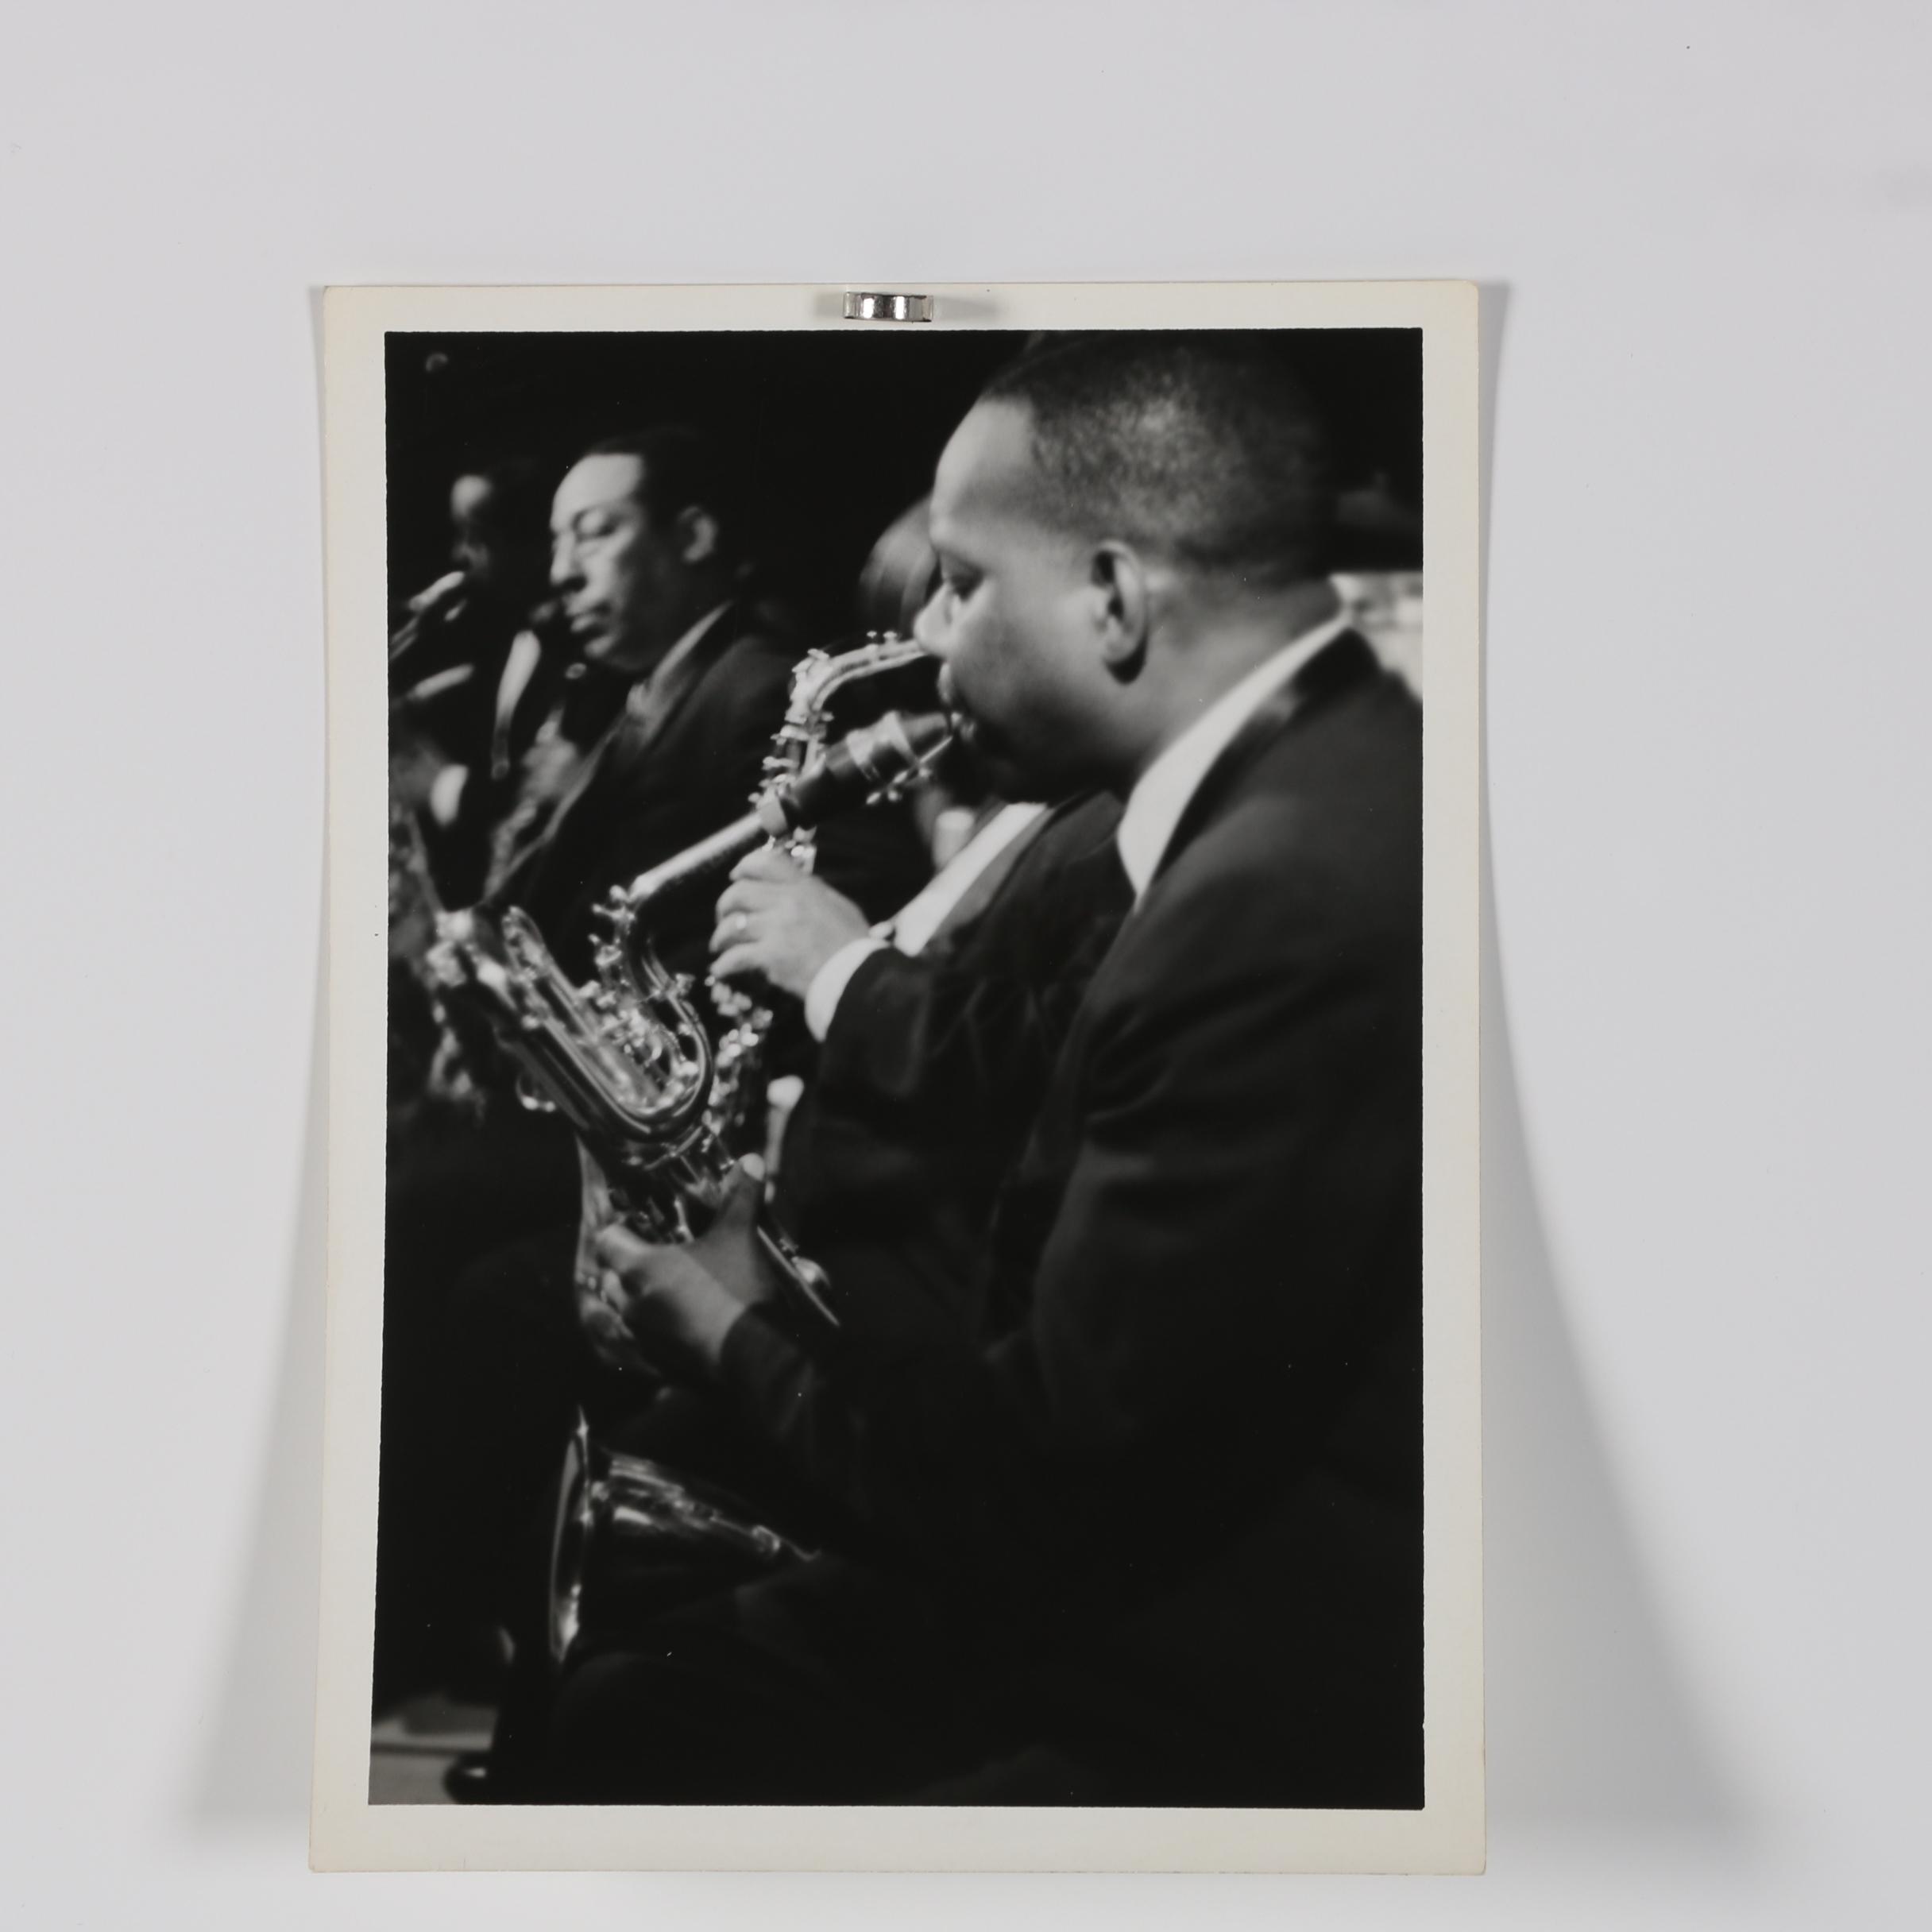 Jack Bradley Photograph of the Duke Ellington Band with Johnny Hodges